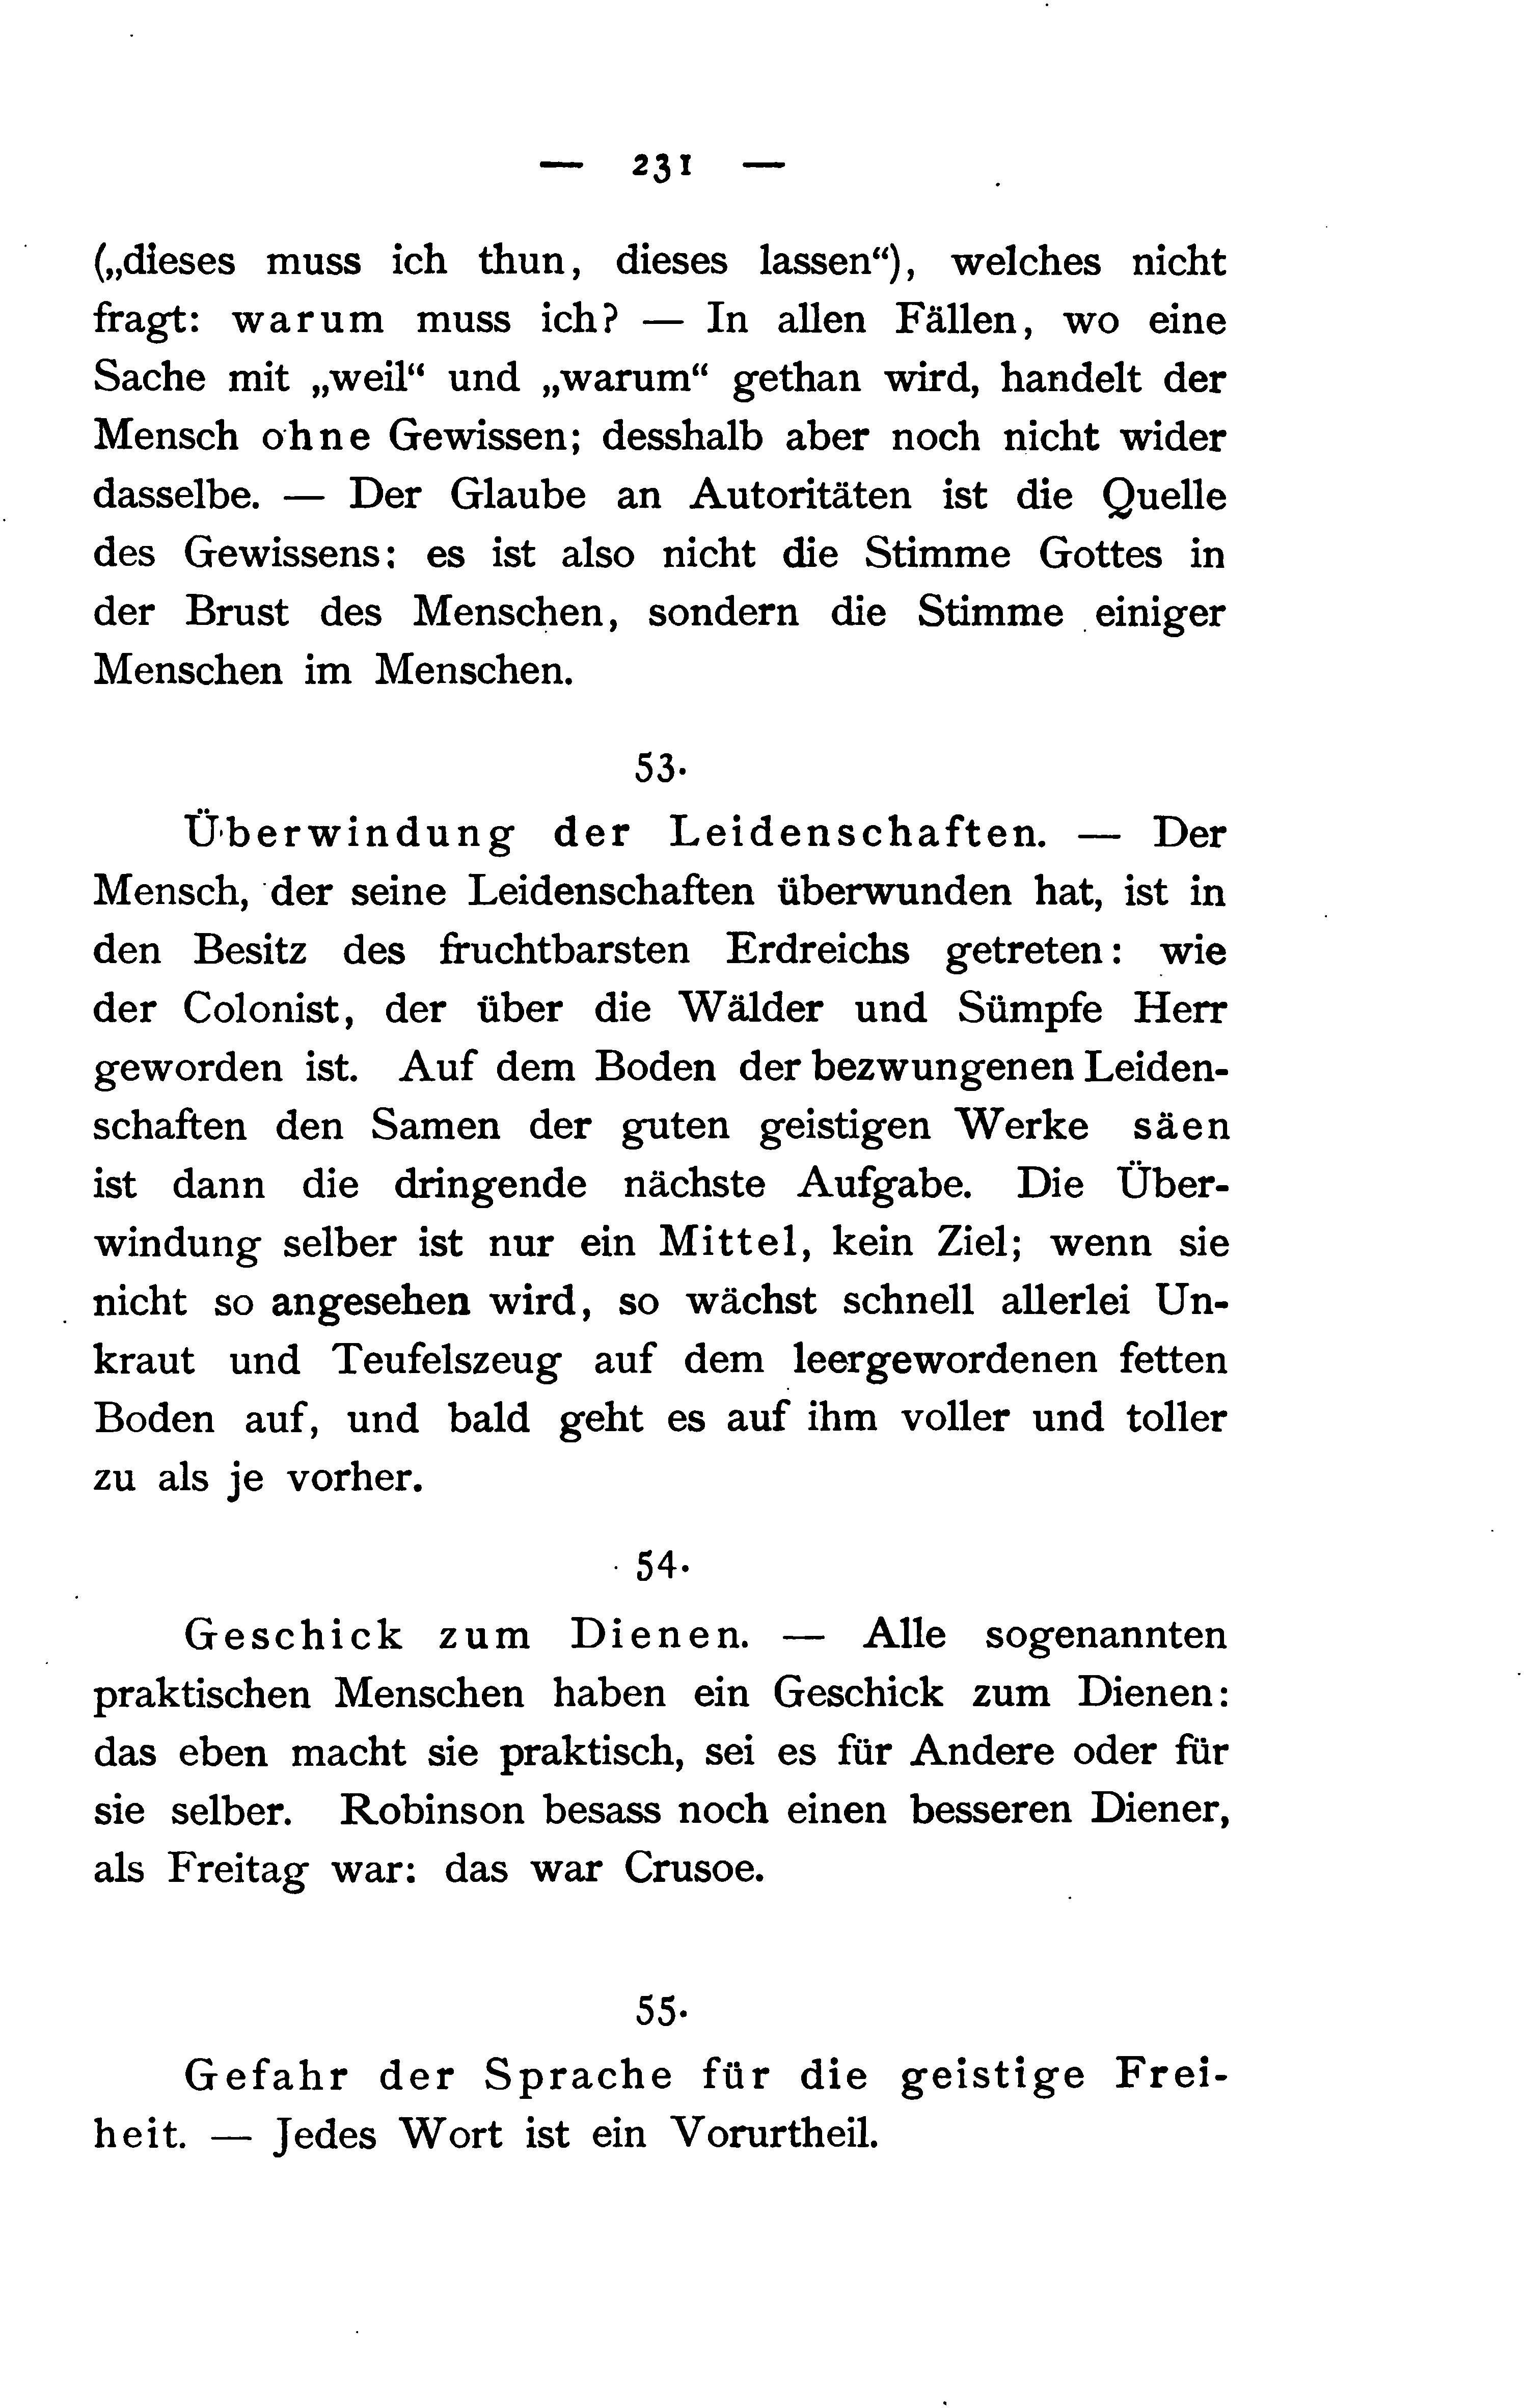 File:Nietzsche\'s Werke, III - 245.jpg - Wikimedia Commons